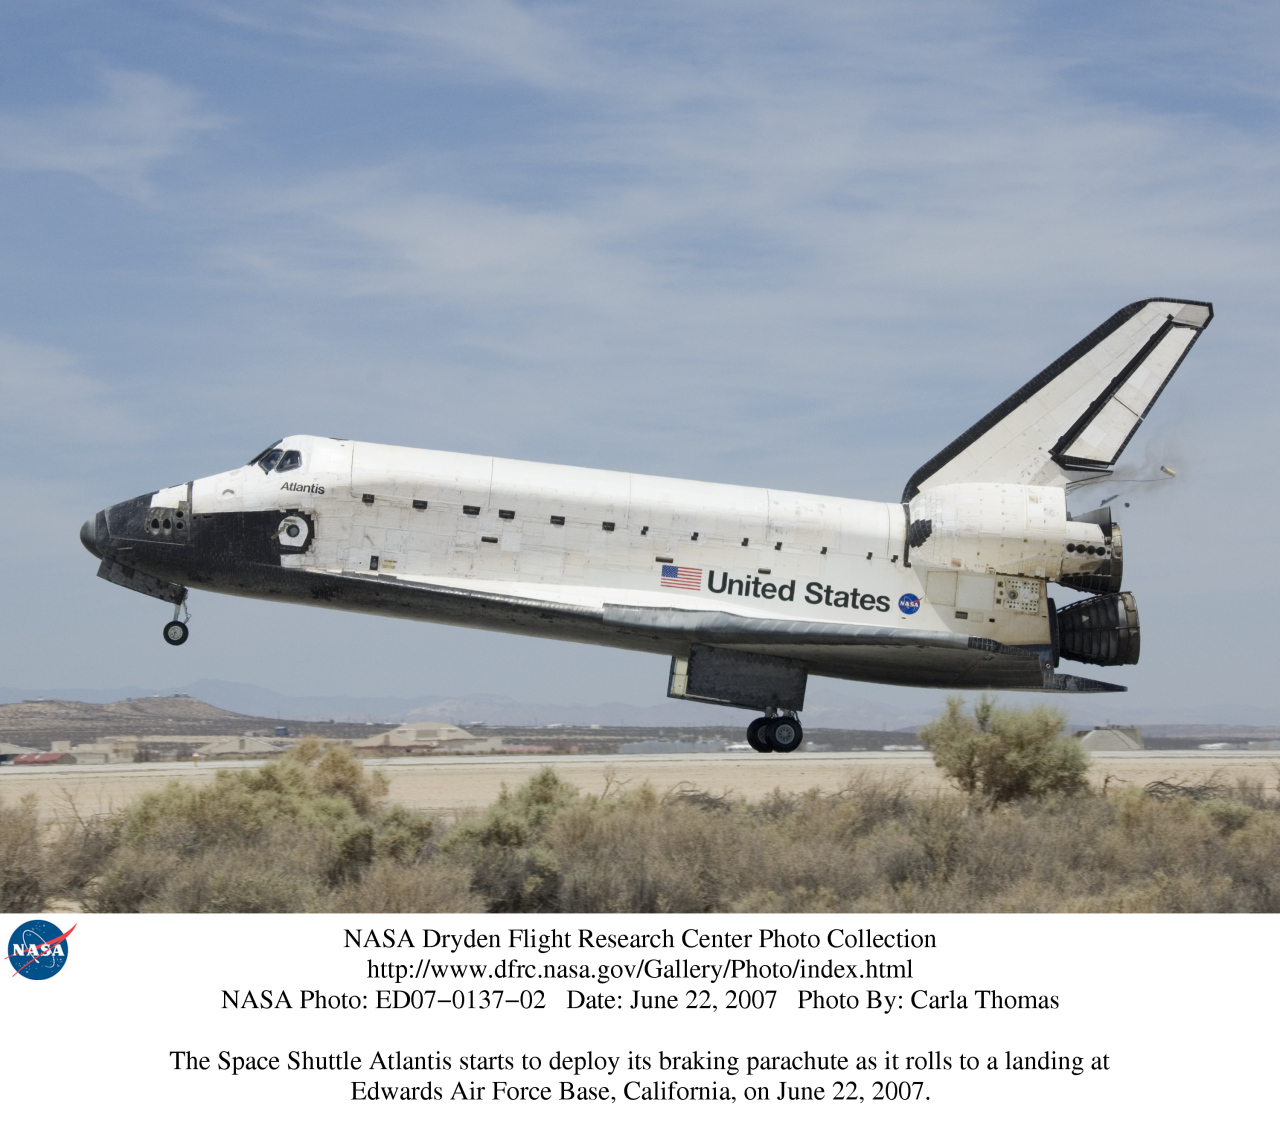 during a space shuttle landing a parachute deploys - photo #20